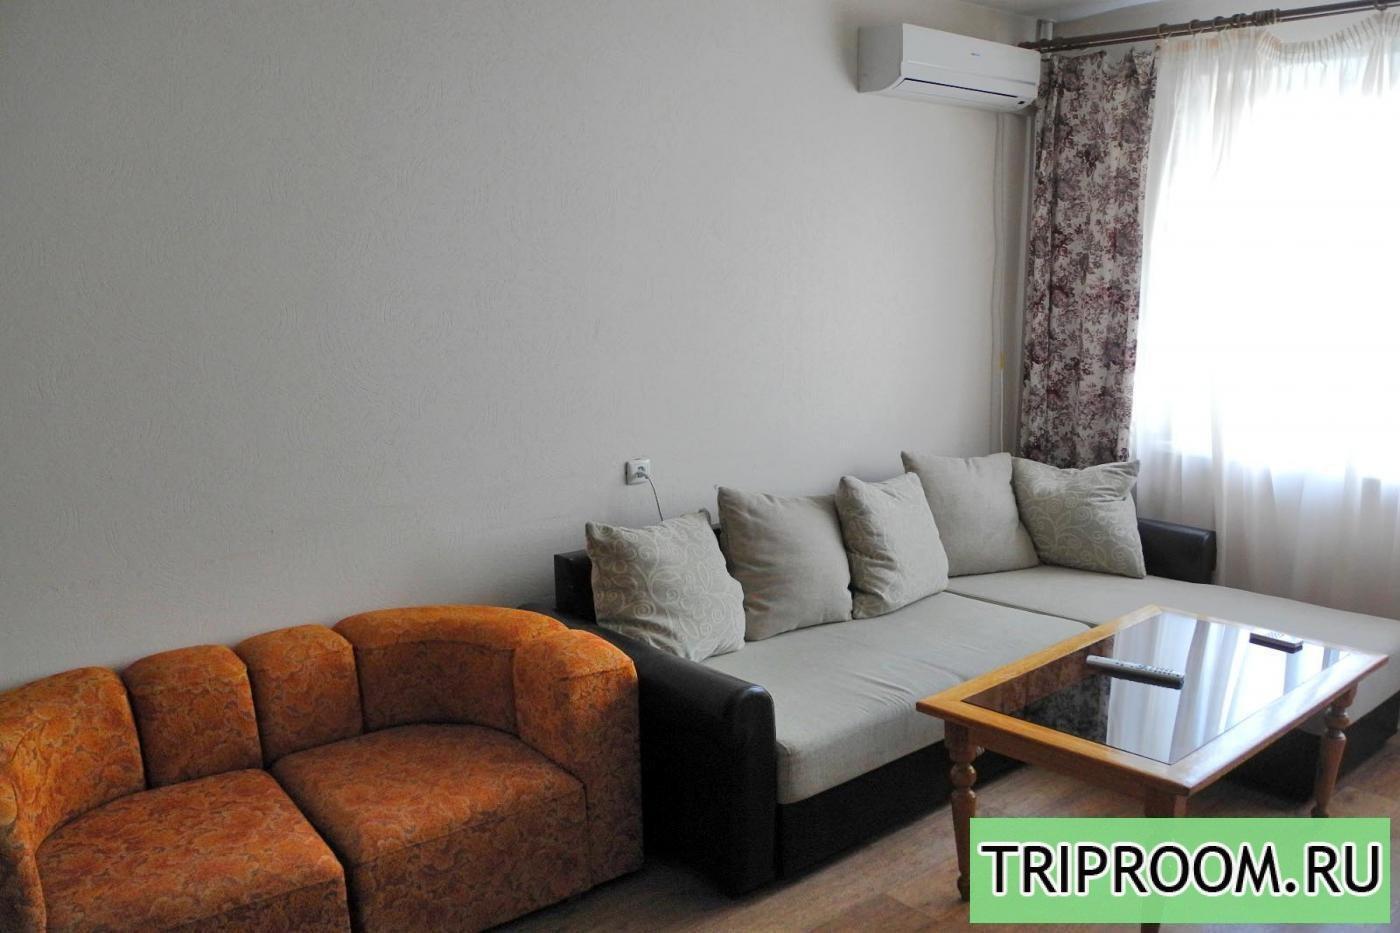 2-комнатная квартира посуточно (вариант № 3868), ул. Кропоткина улица, фото № 1